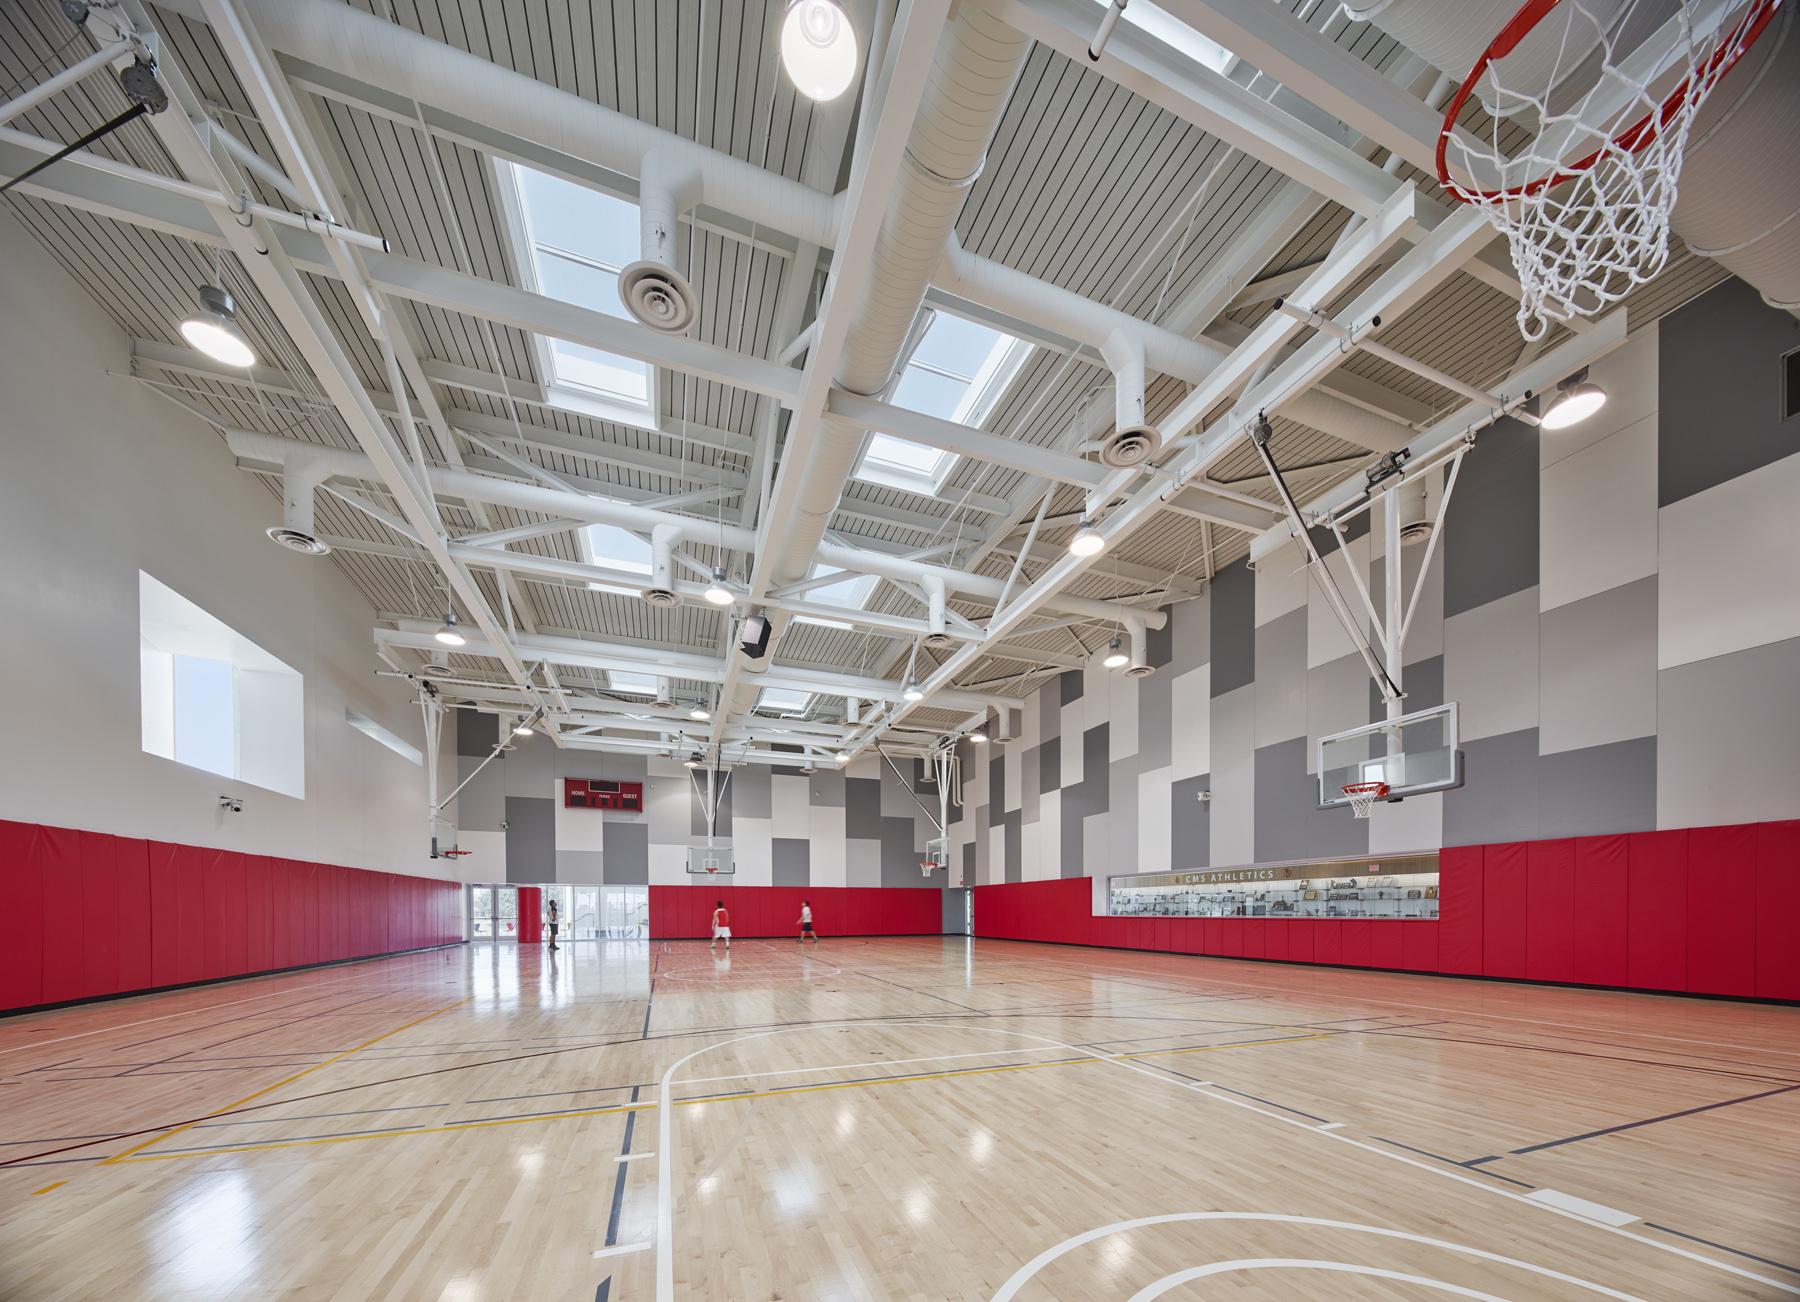 Recreation gym